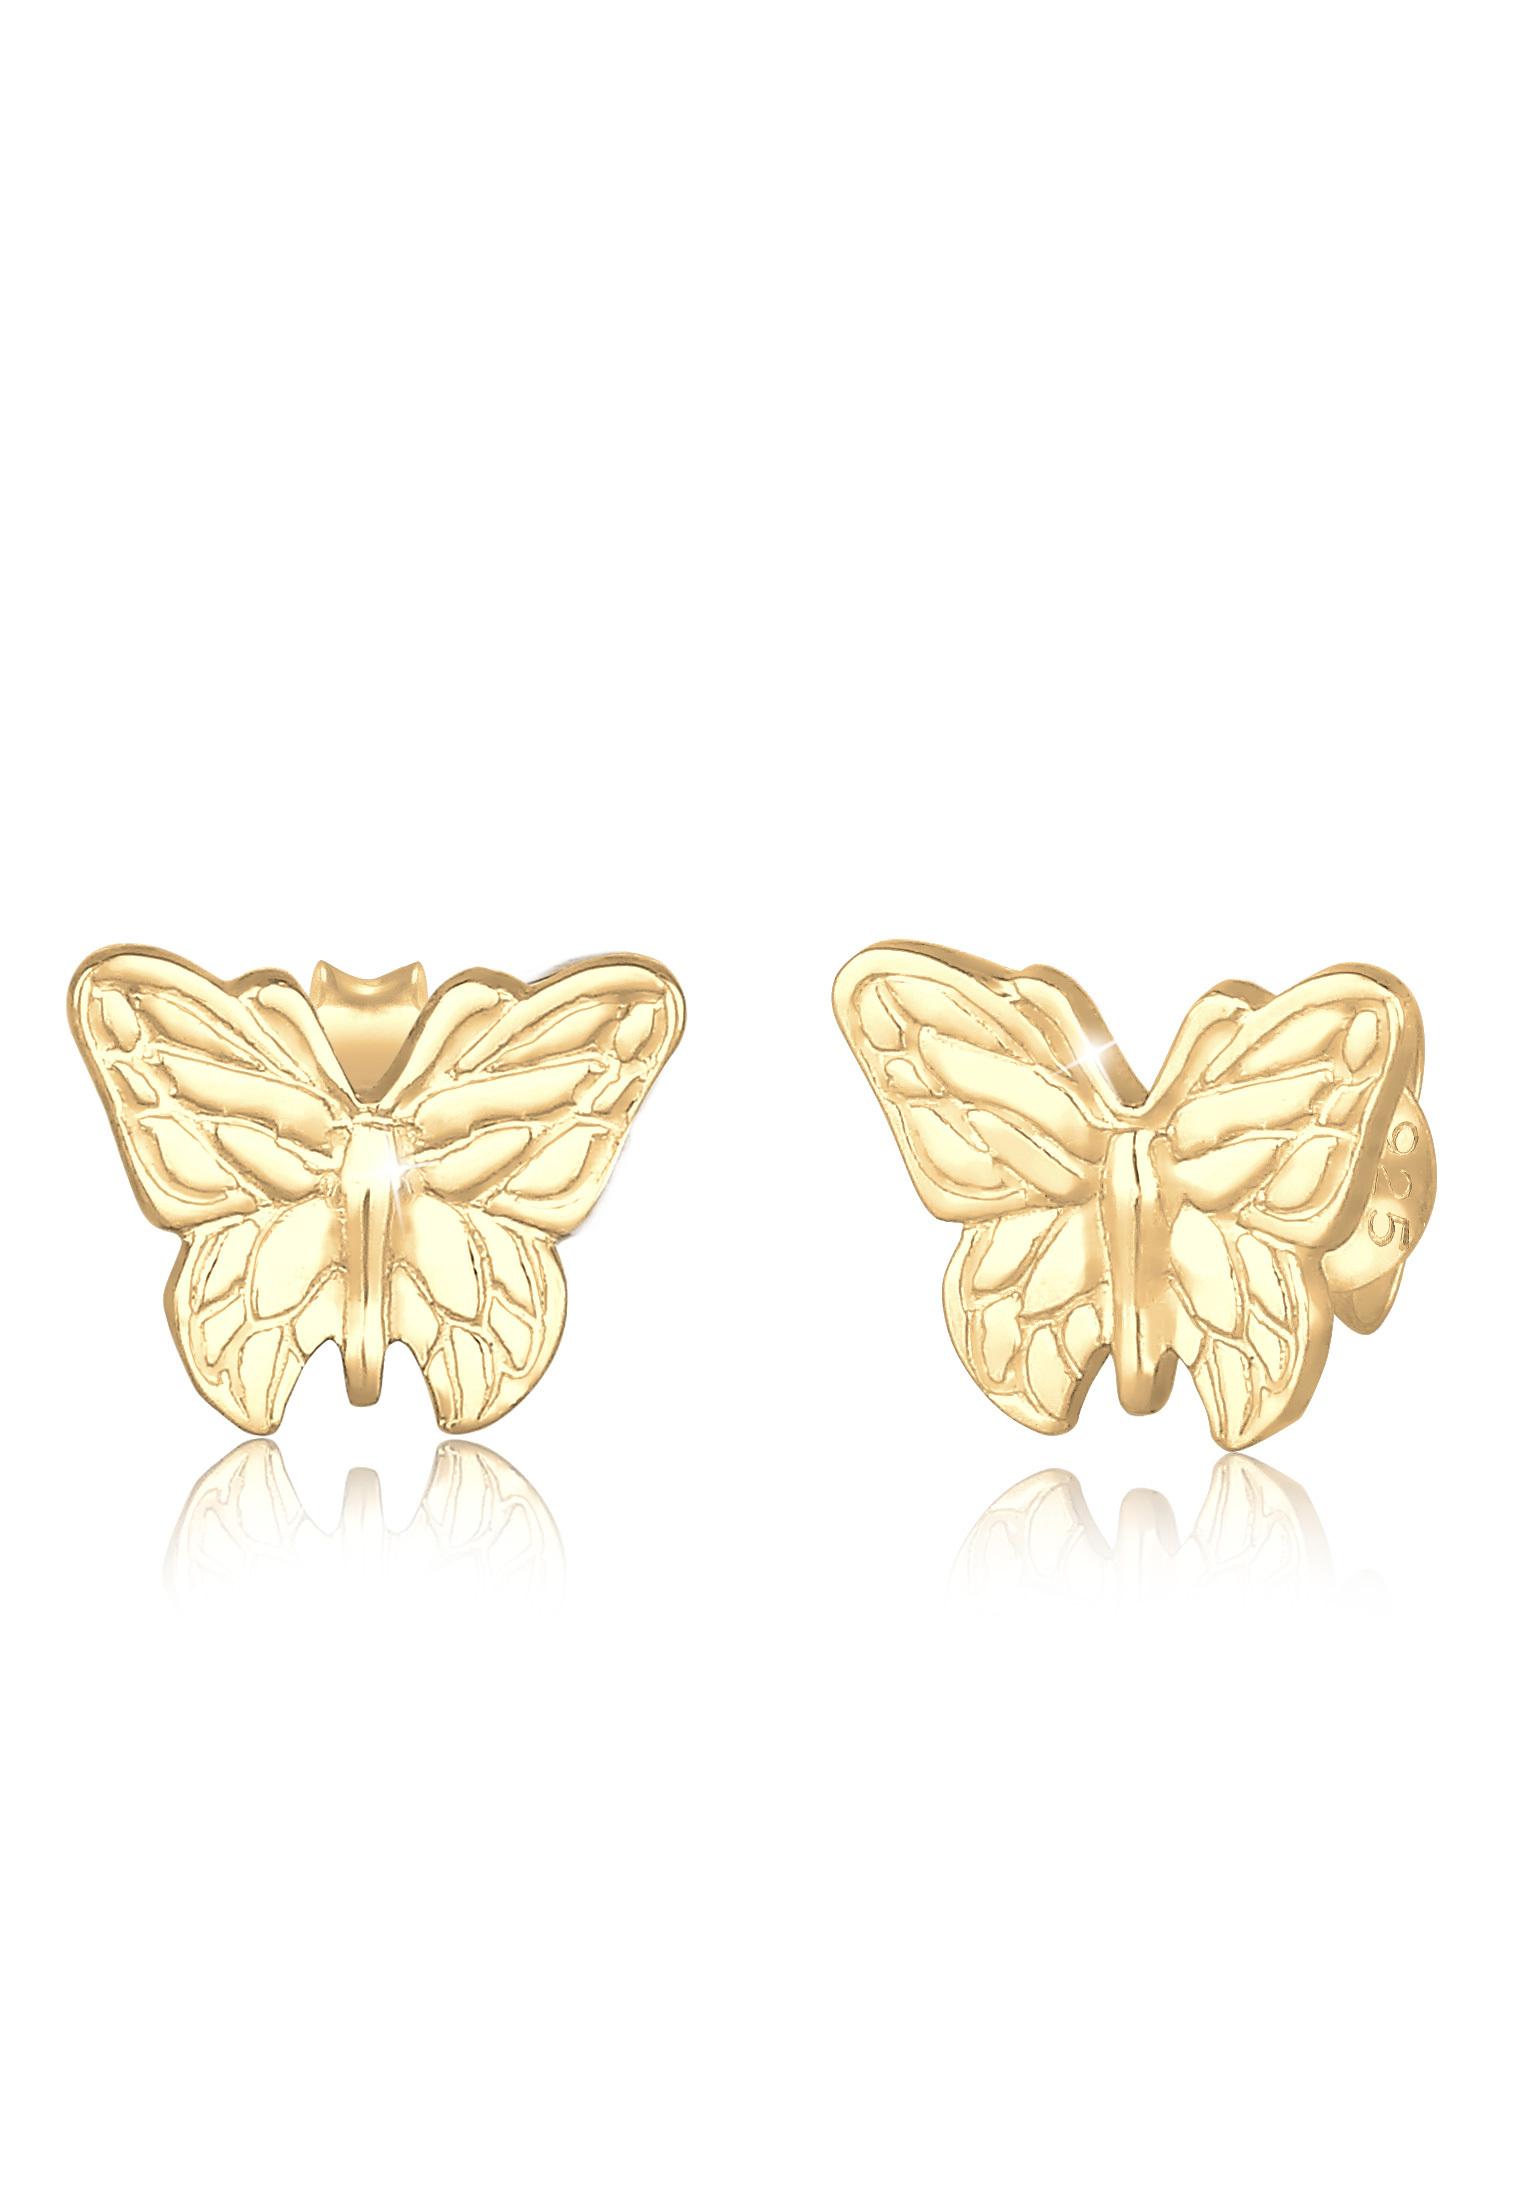 Ohrstecker Schmetterling   925 Sterling Silber vergoldet